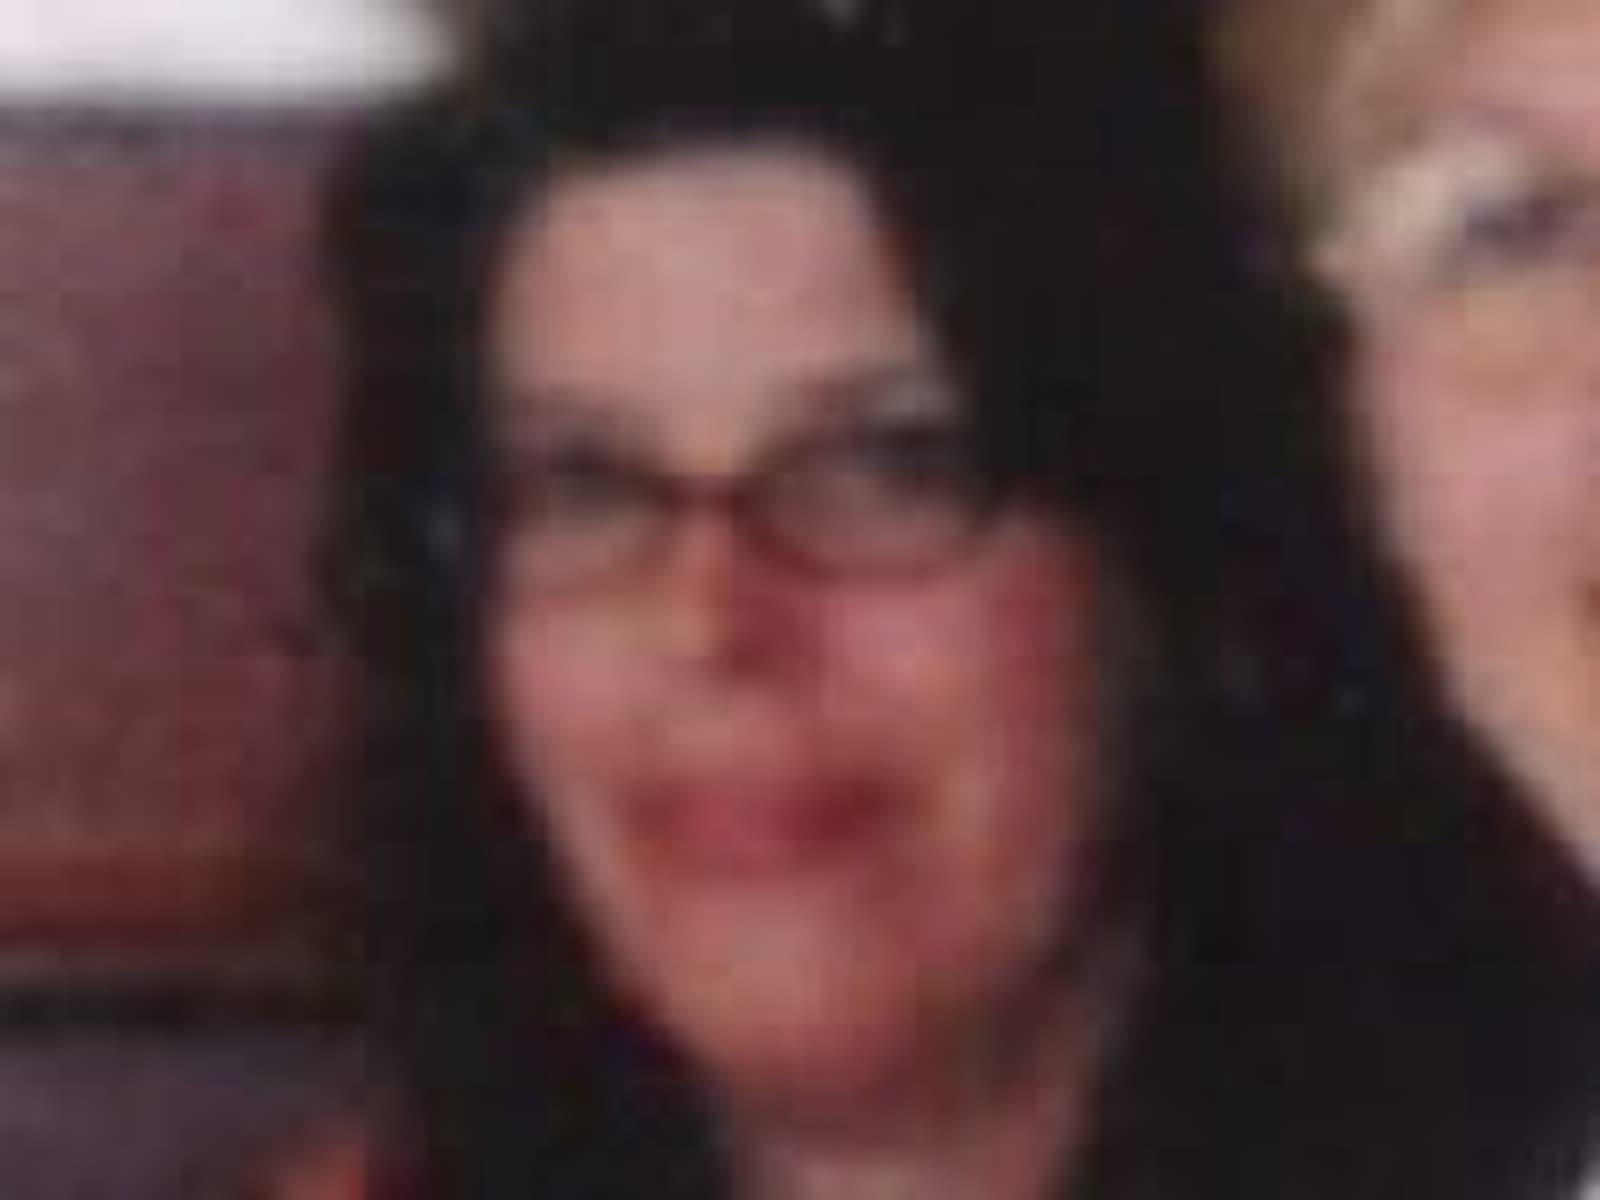 Lori from Minneapolis, Minnesota, United States